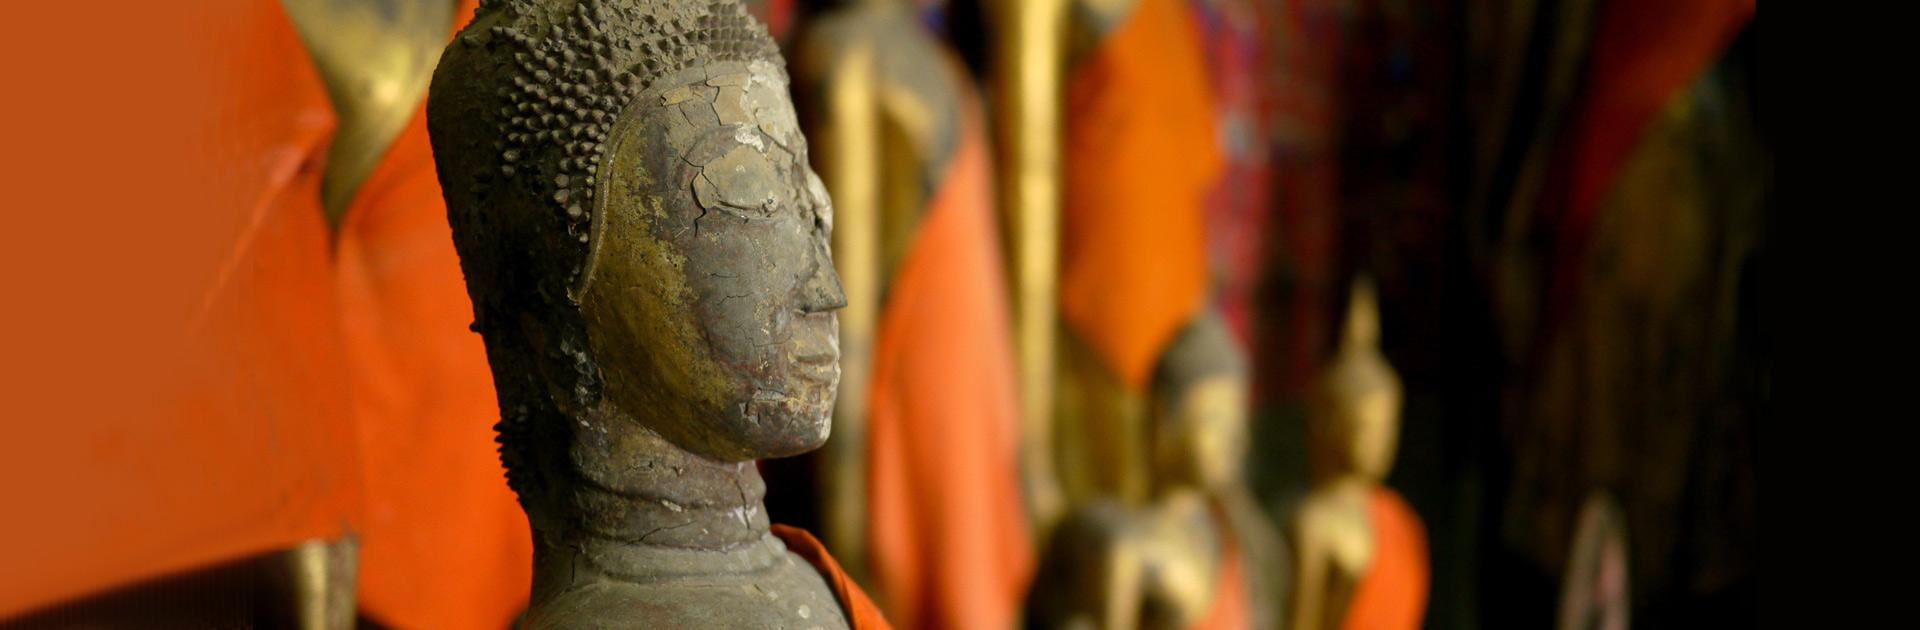 LA Gran Tour de Laos 17 días 1